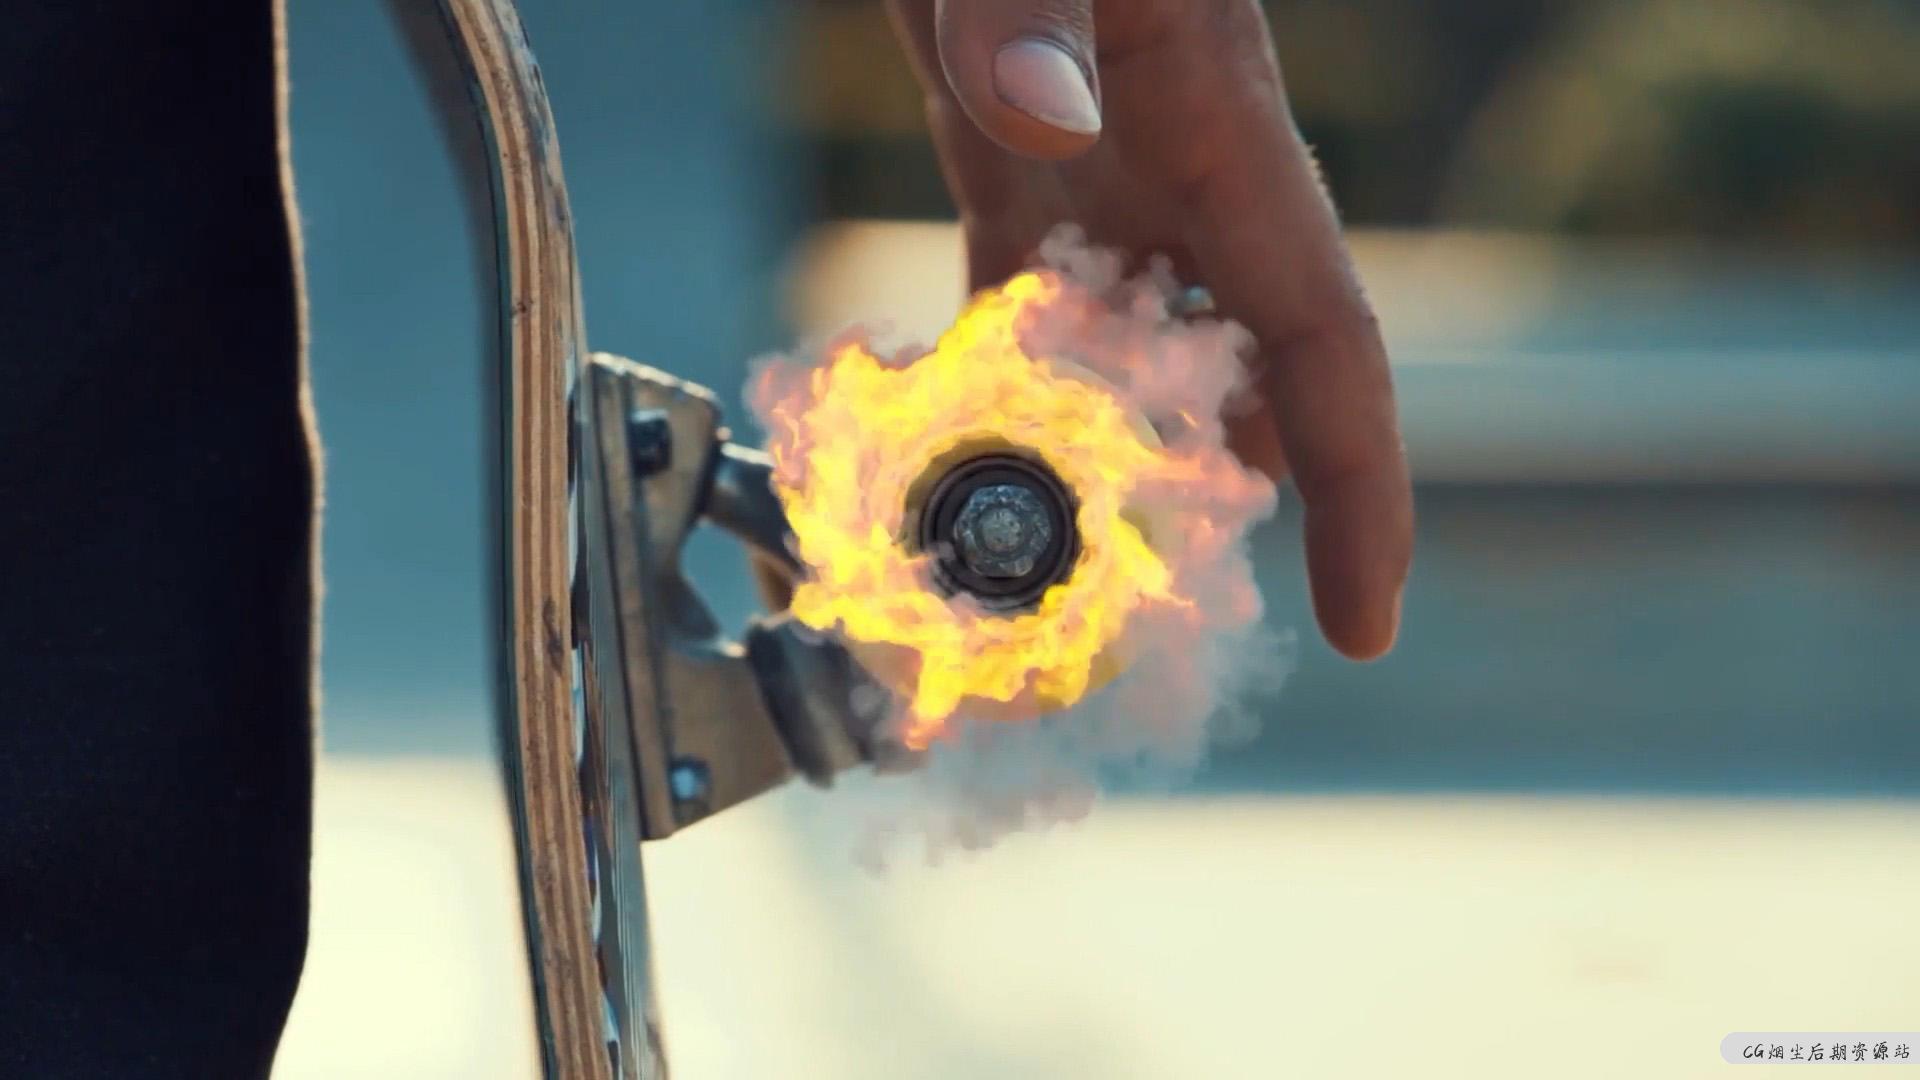 【fcpx插件】仿真模拟烟雾火焰特效动画元素 Smoke And Fire VFX Simulation-CG烟尘后期资源站